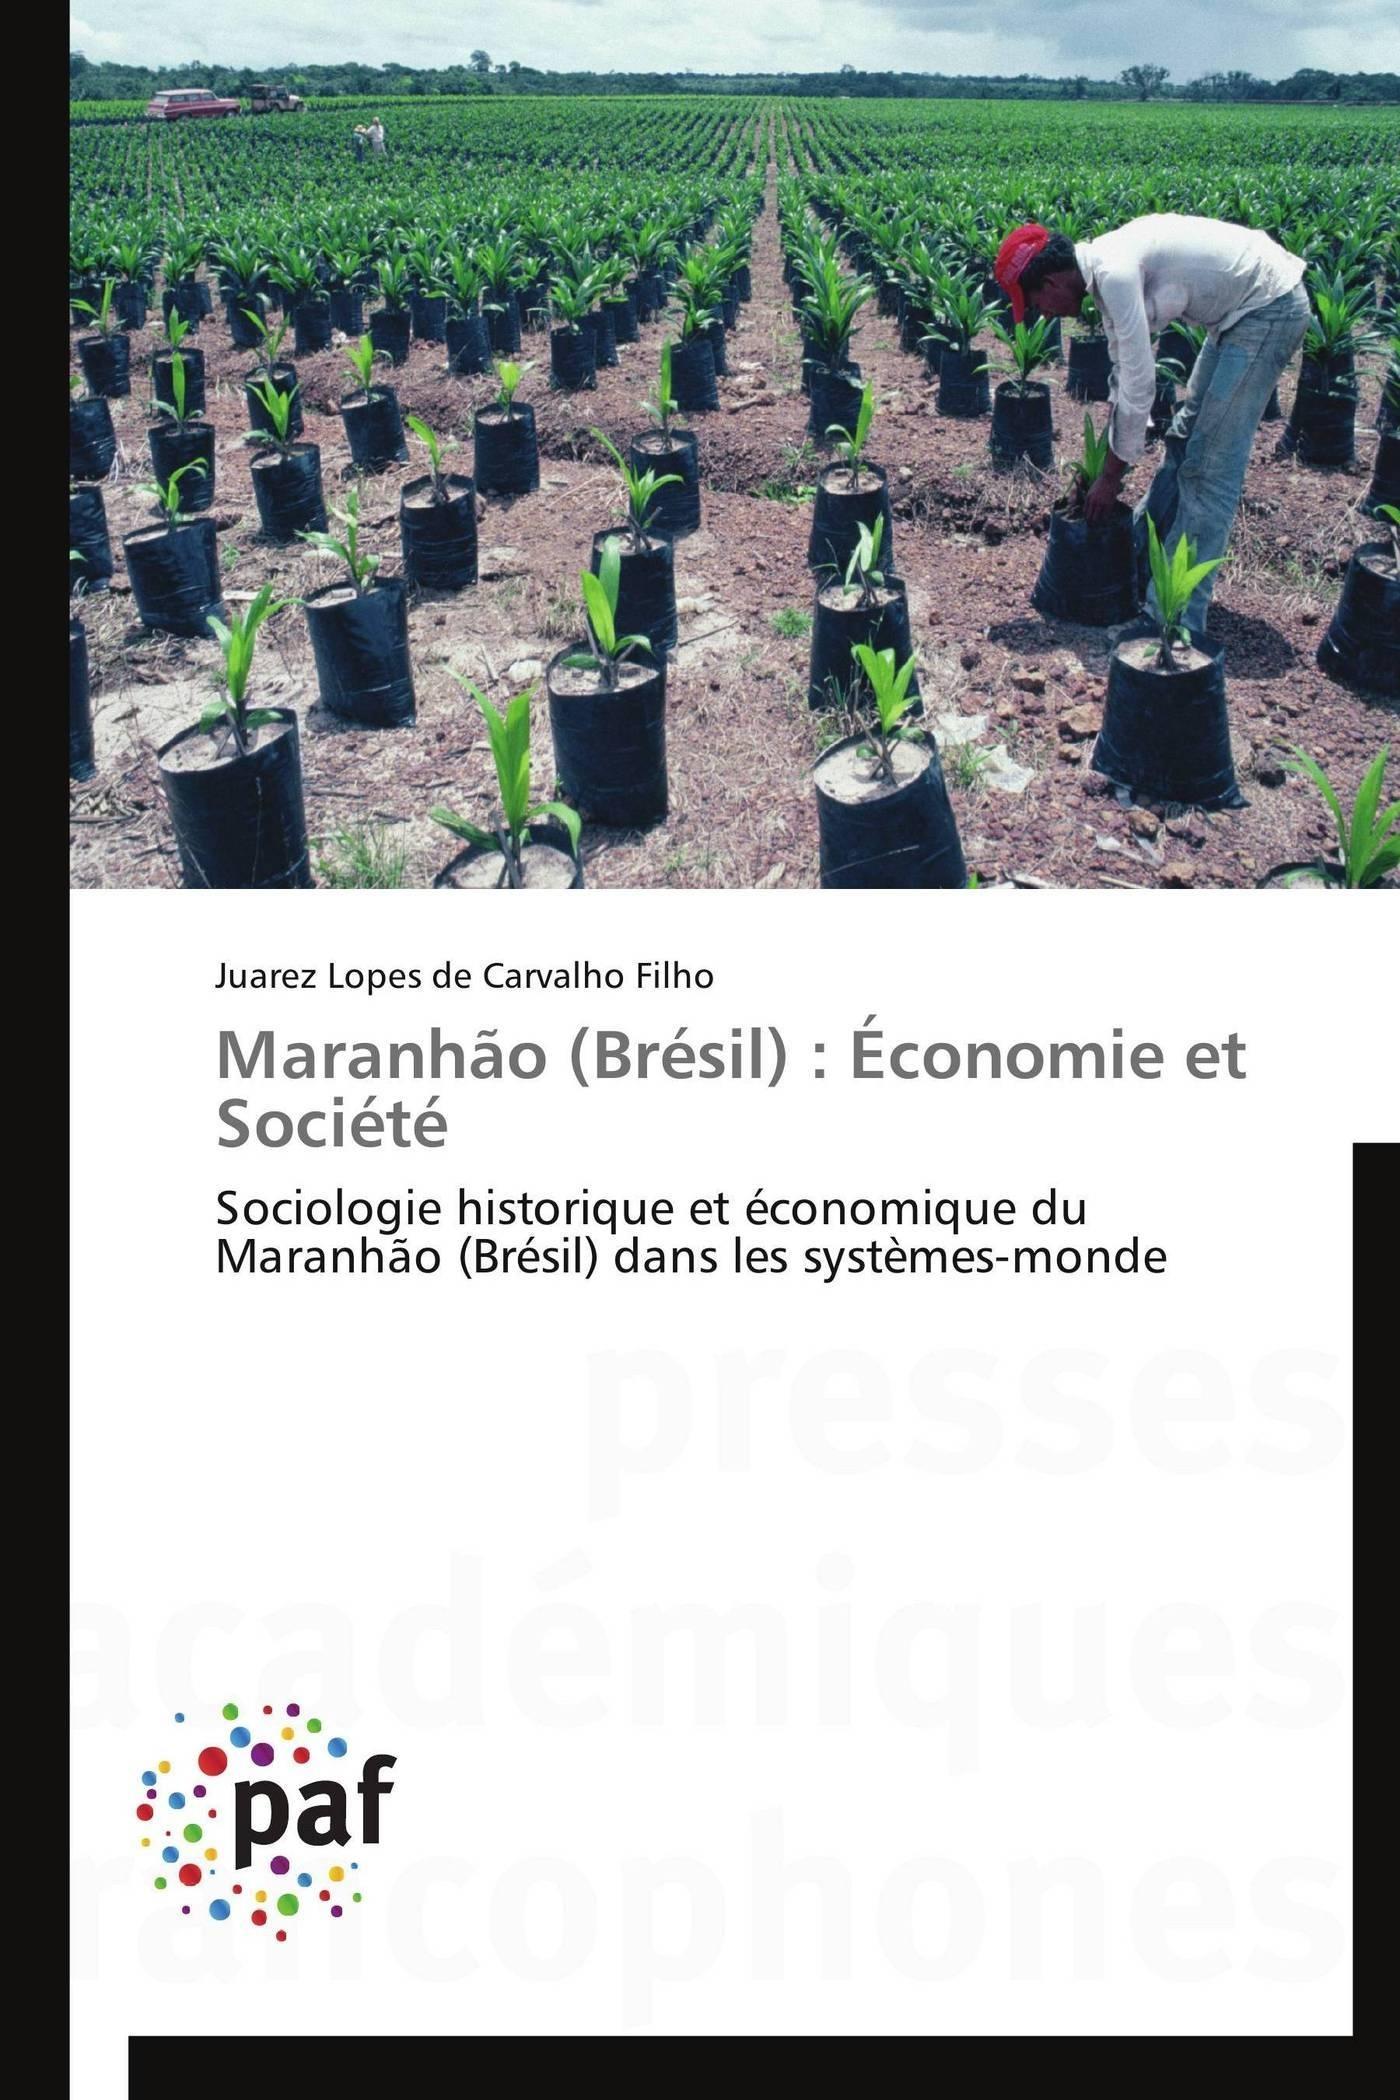 MARANHAO (BRESIL) : ECONOMIE ET SOCIETE